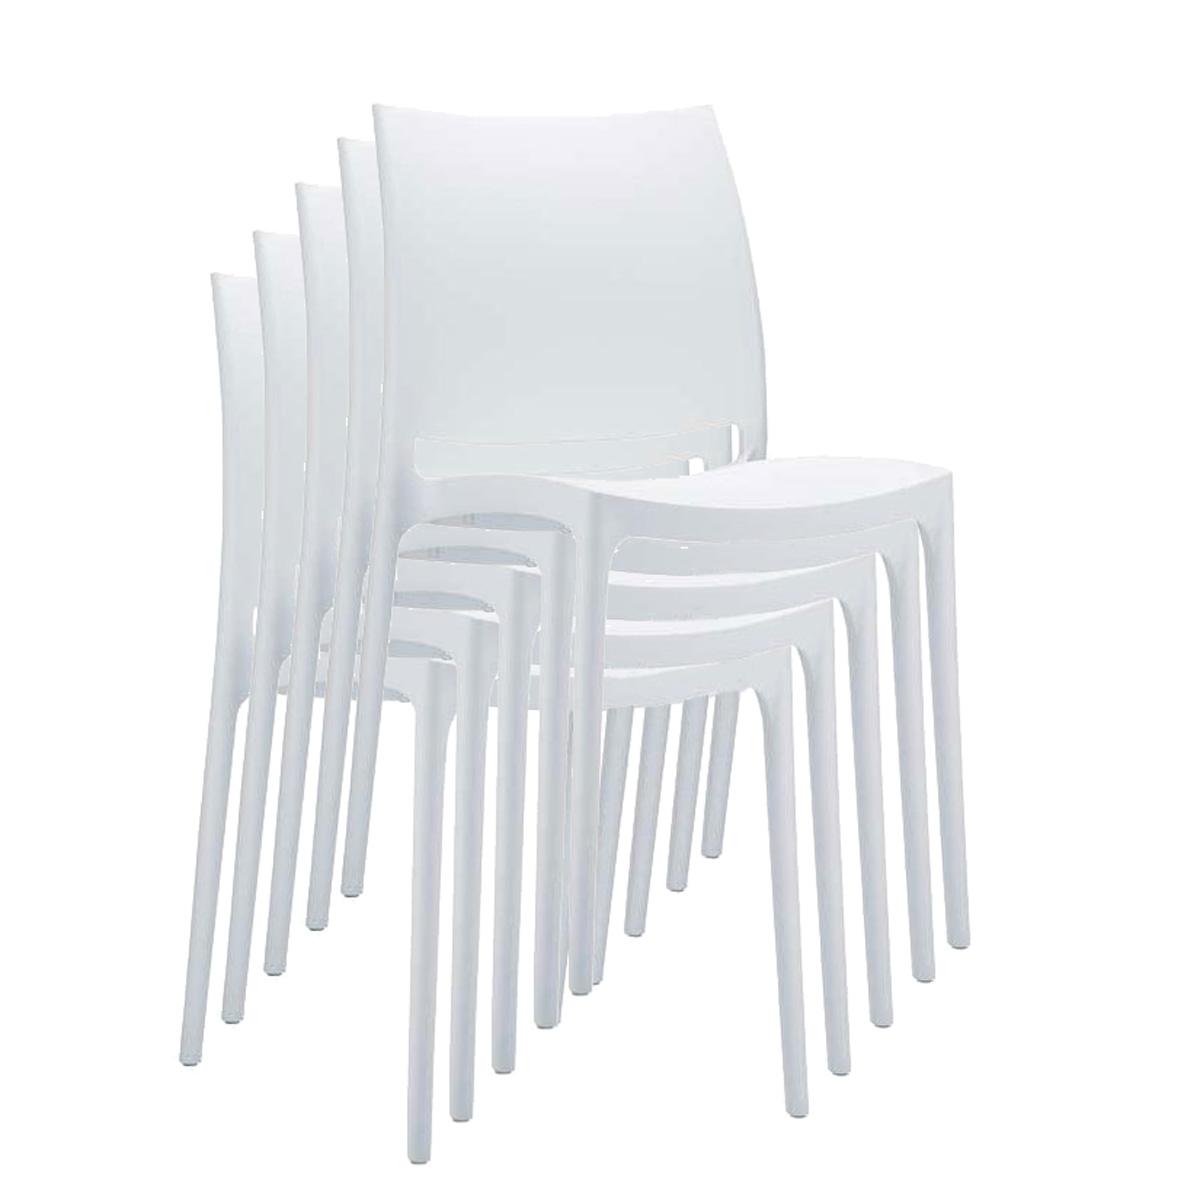 Extrem Stapelstuhl Bistrostuhl Gartenstuhl Kunststoff C44 ~ weiß KI22